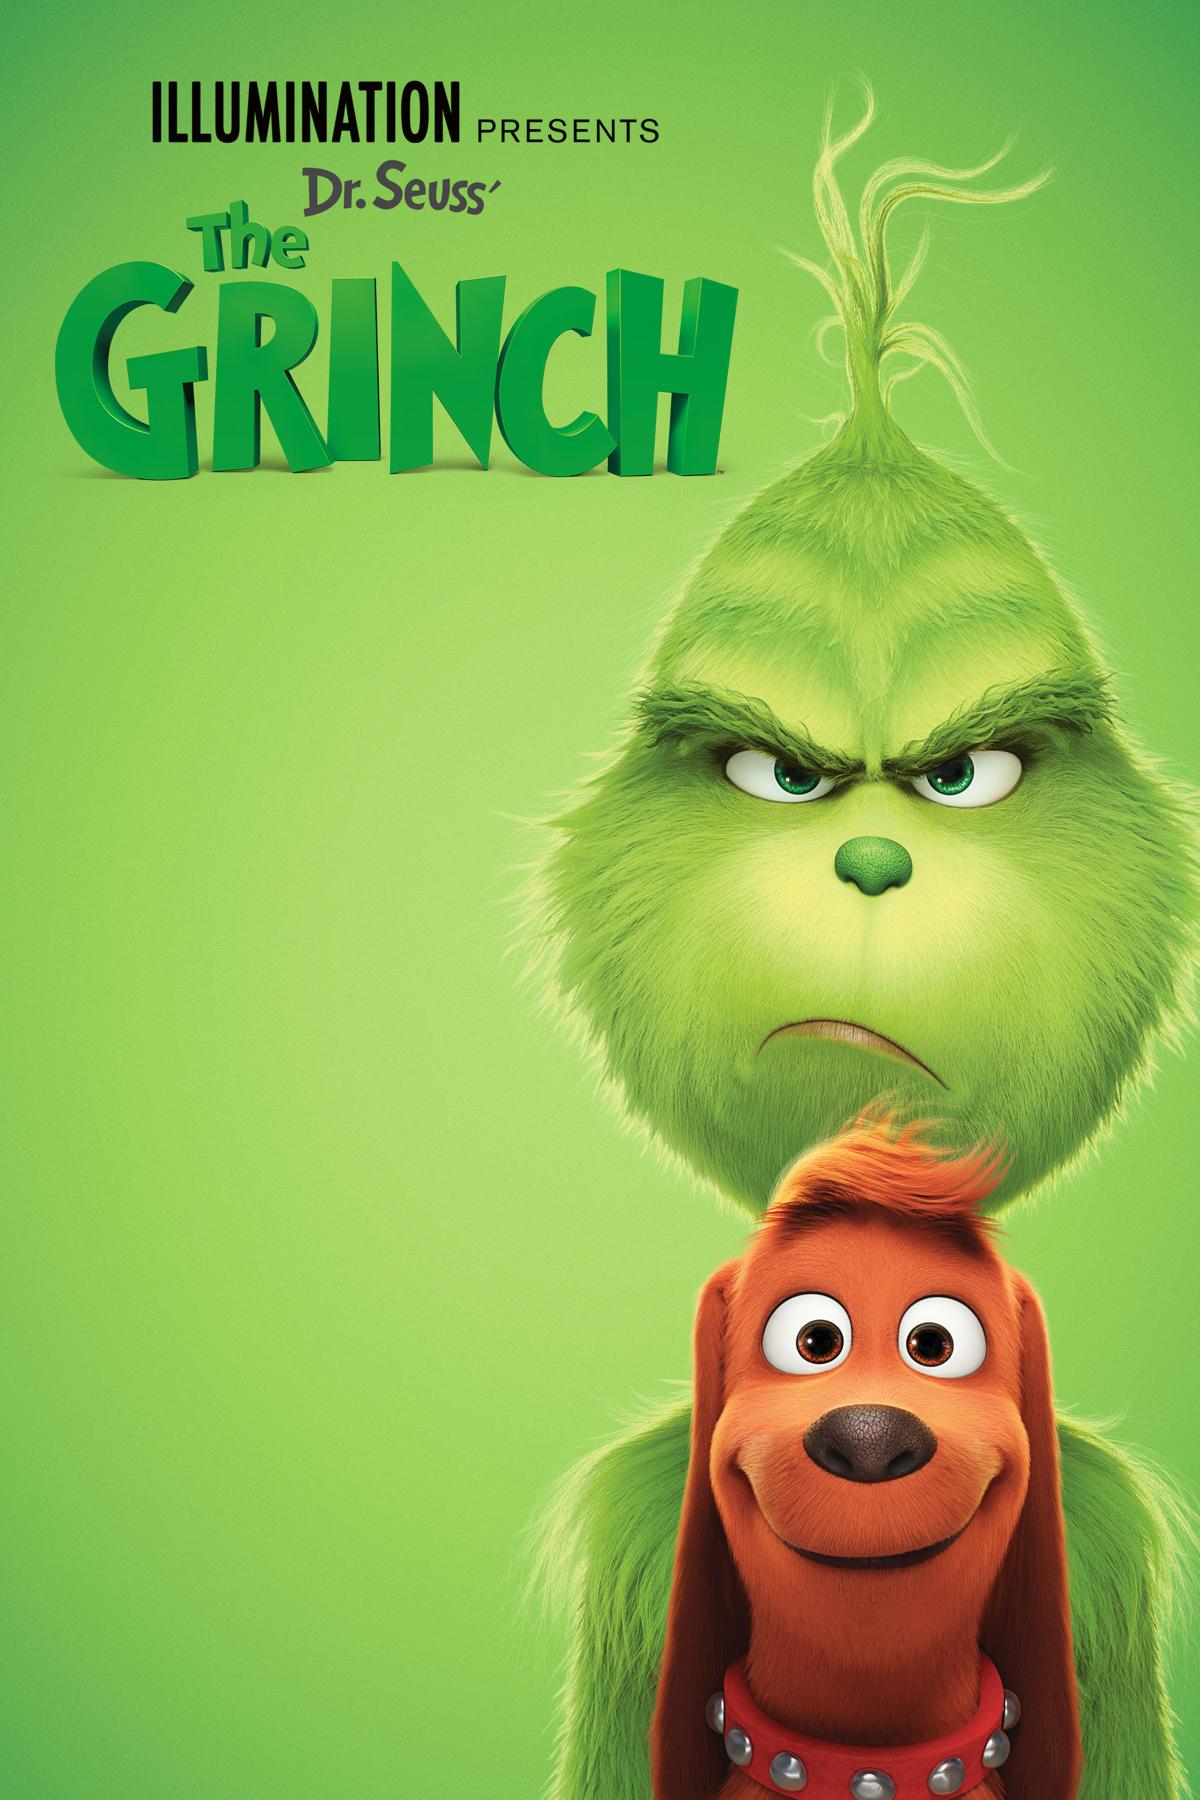 Max The Grinch 2018 The Grinch Dog The Grinch Movie Grinch